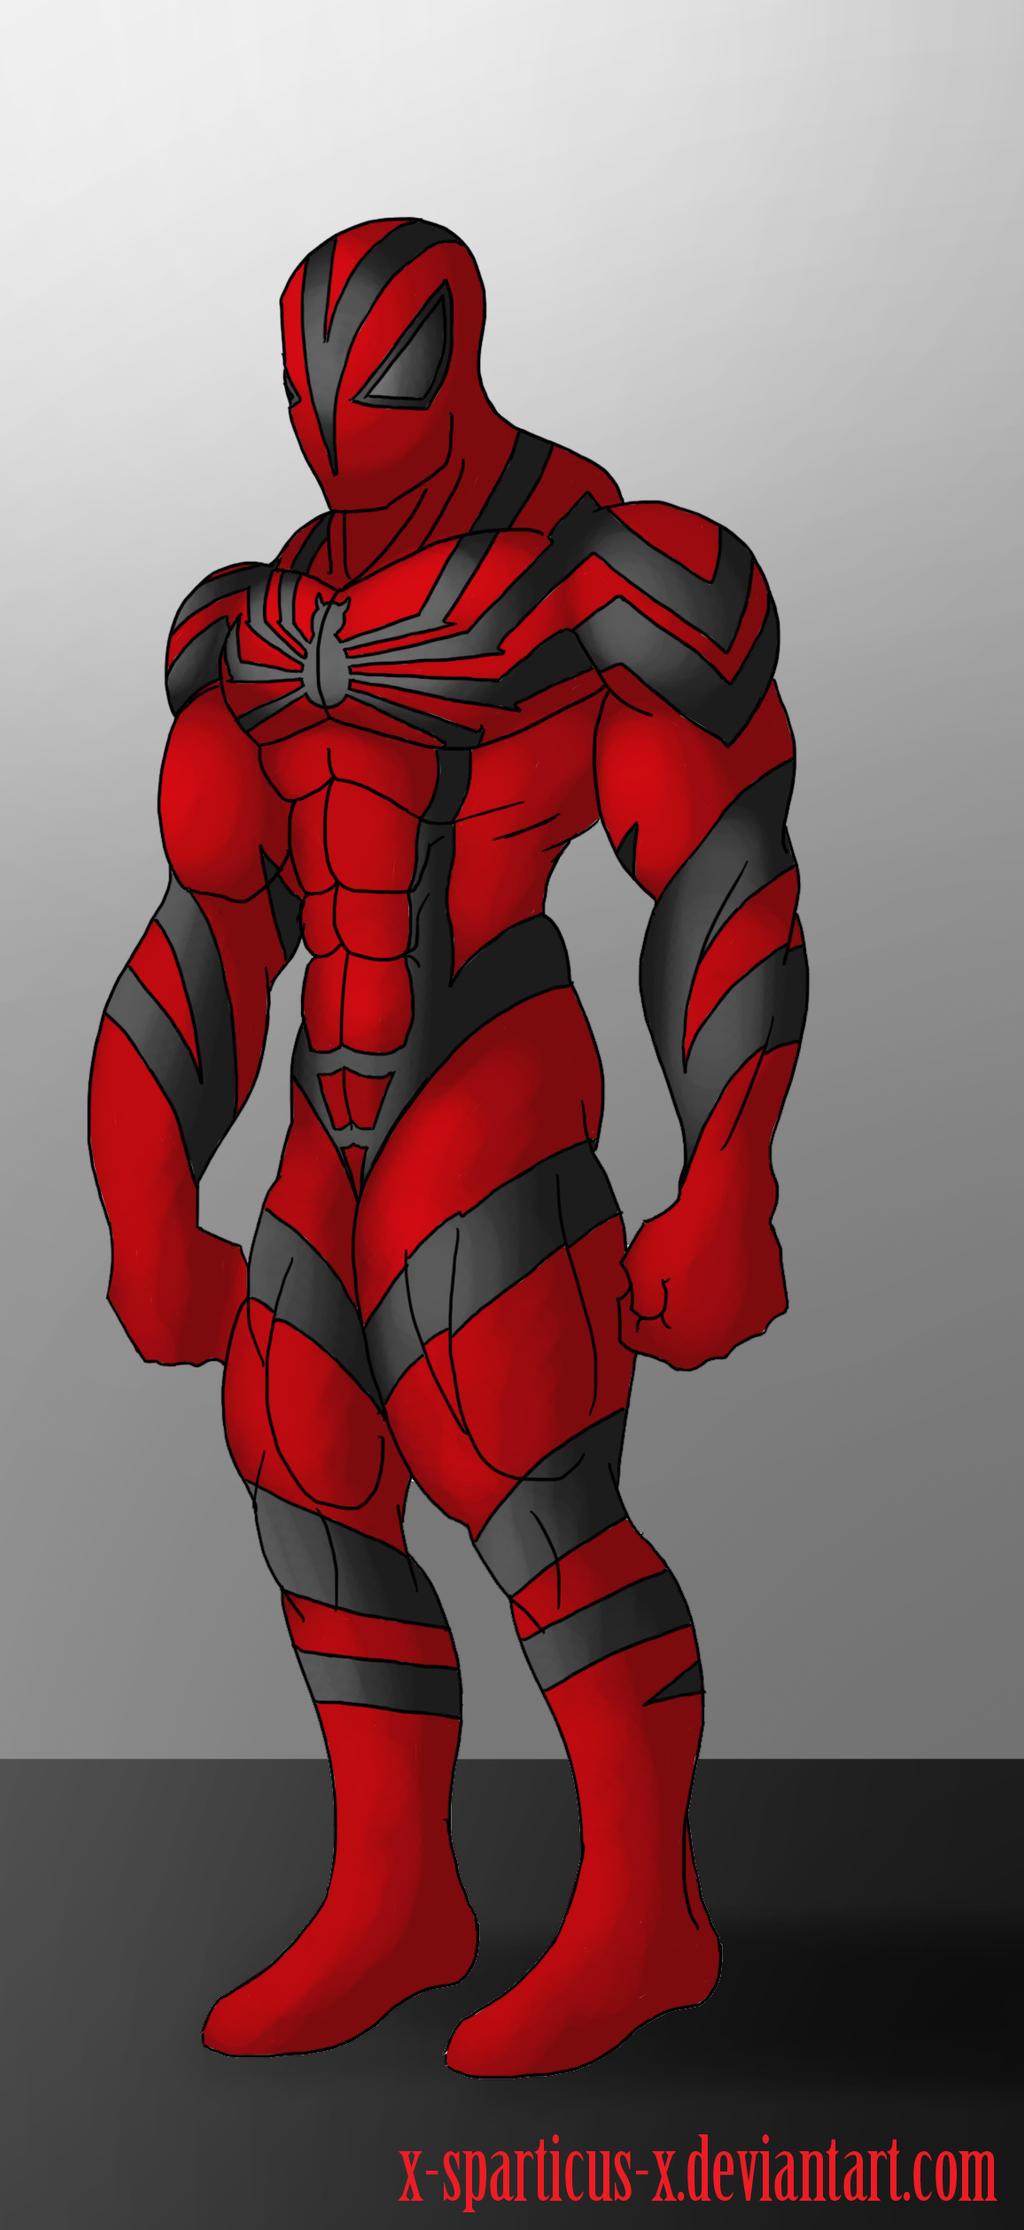 Spiderman Concept Costume By X Sparticus X On Deviantart